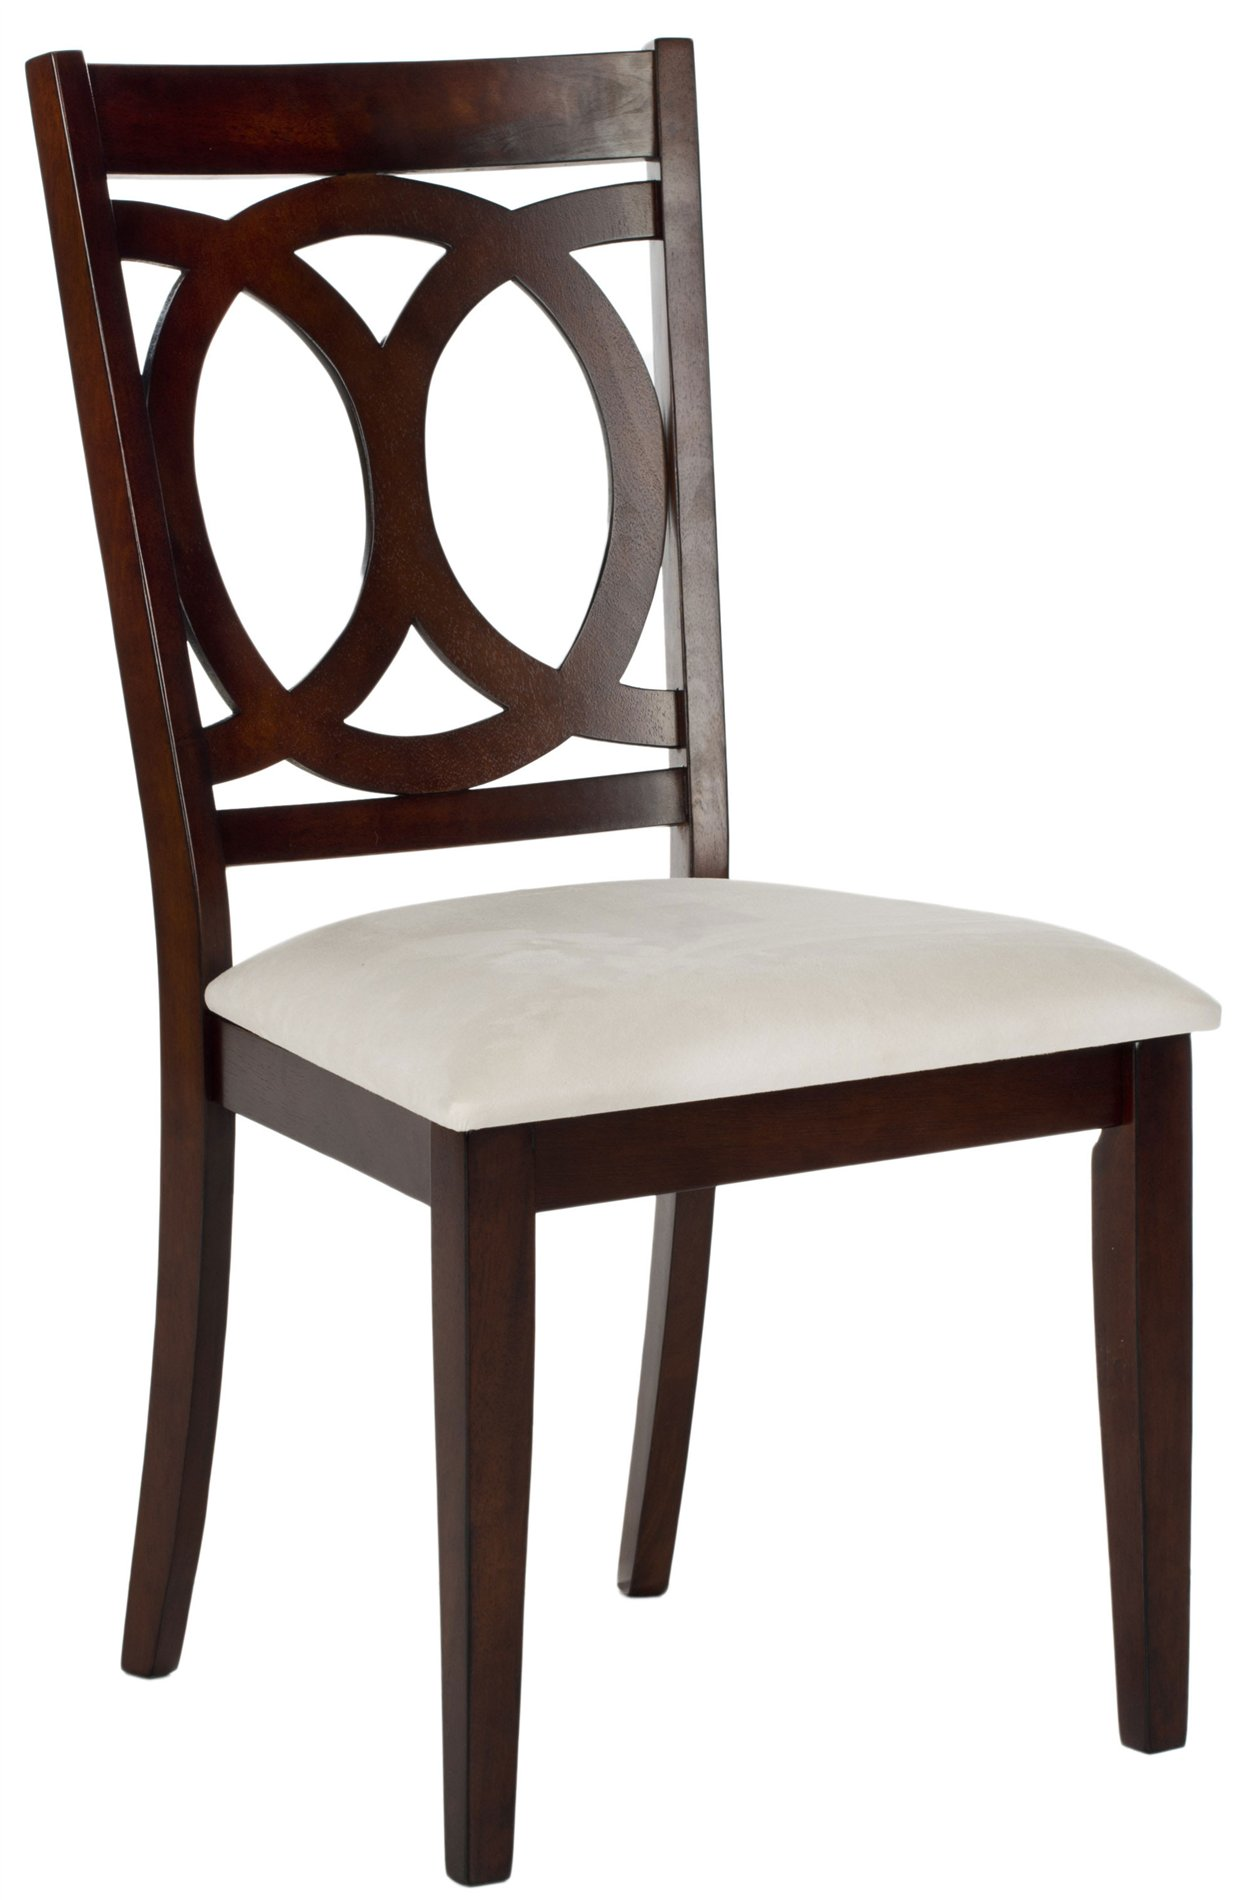 safavieh sea3000a set2 drew dining side chair sfv sea3000a set2. Black Bedroom Furniture Sets. Home Design Ideas